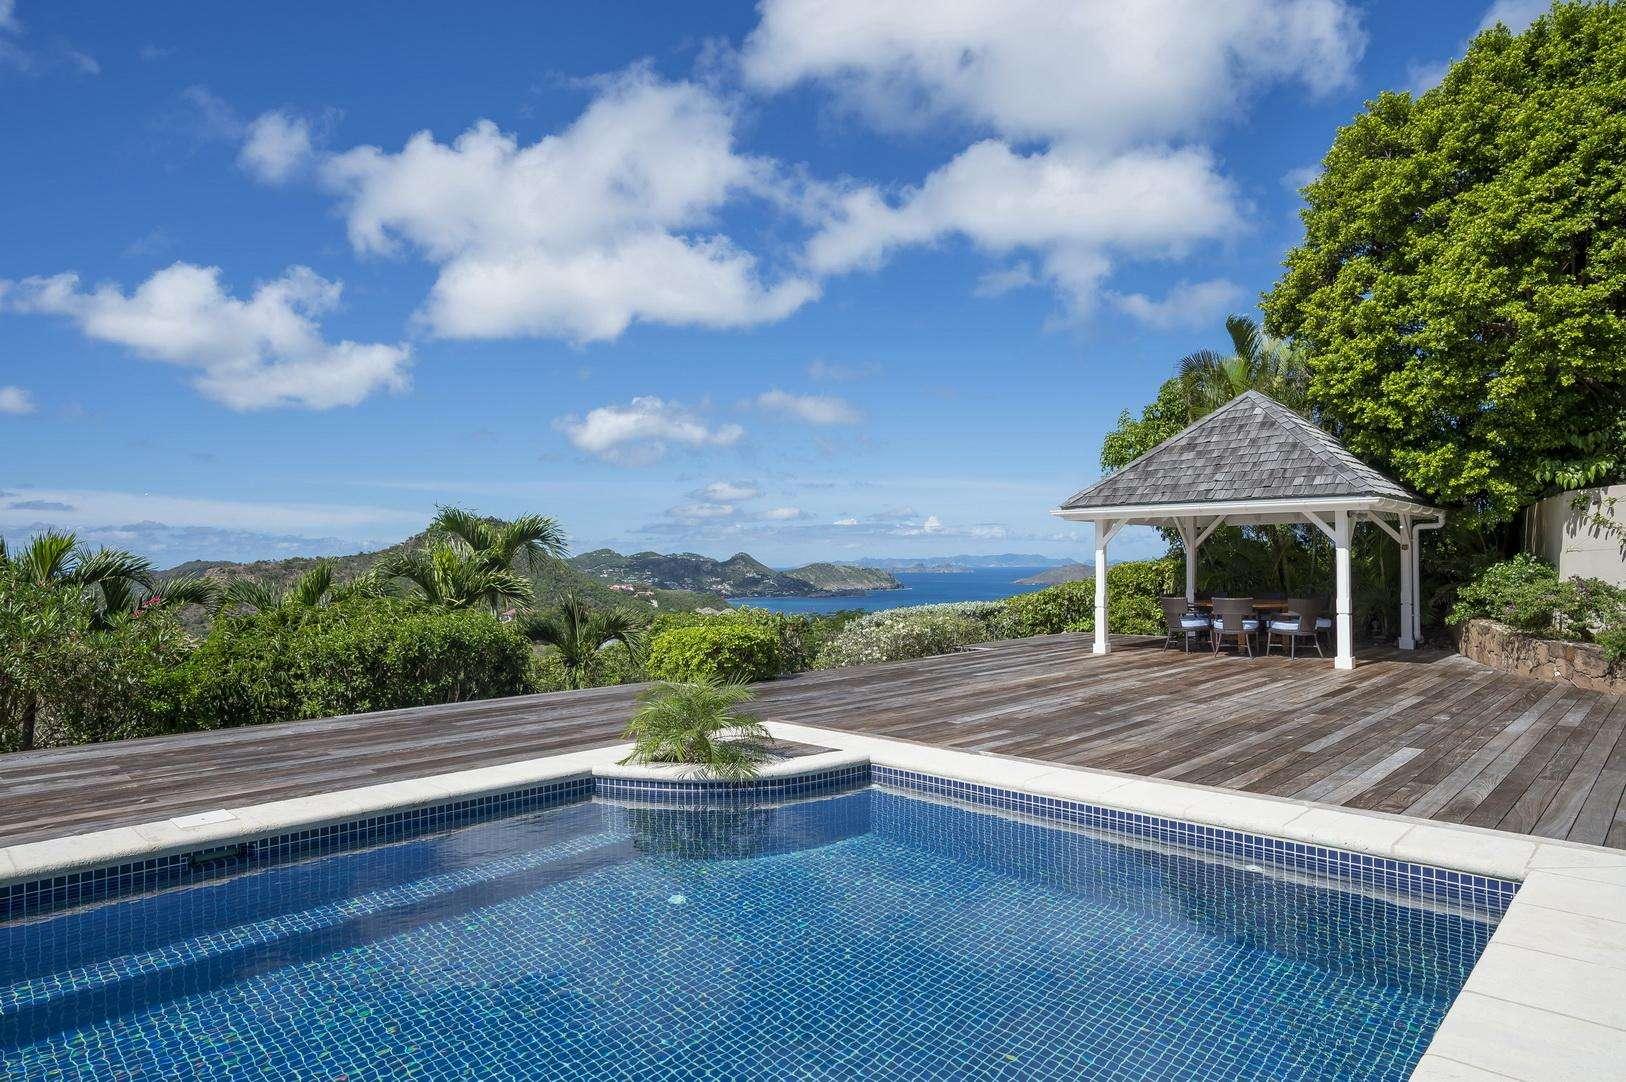 Luxury villa rentals caribbean - St barthelemy - Petite saline - la Plantation - Image 1/34